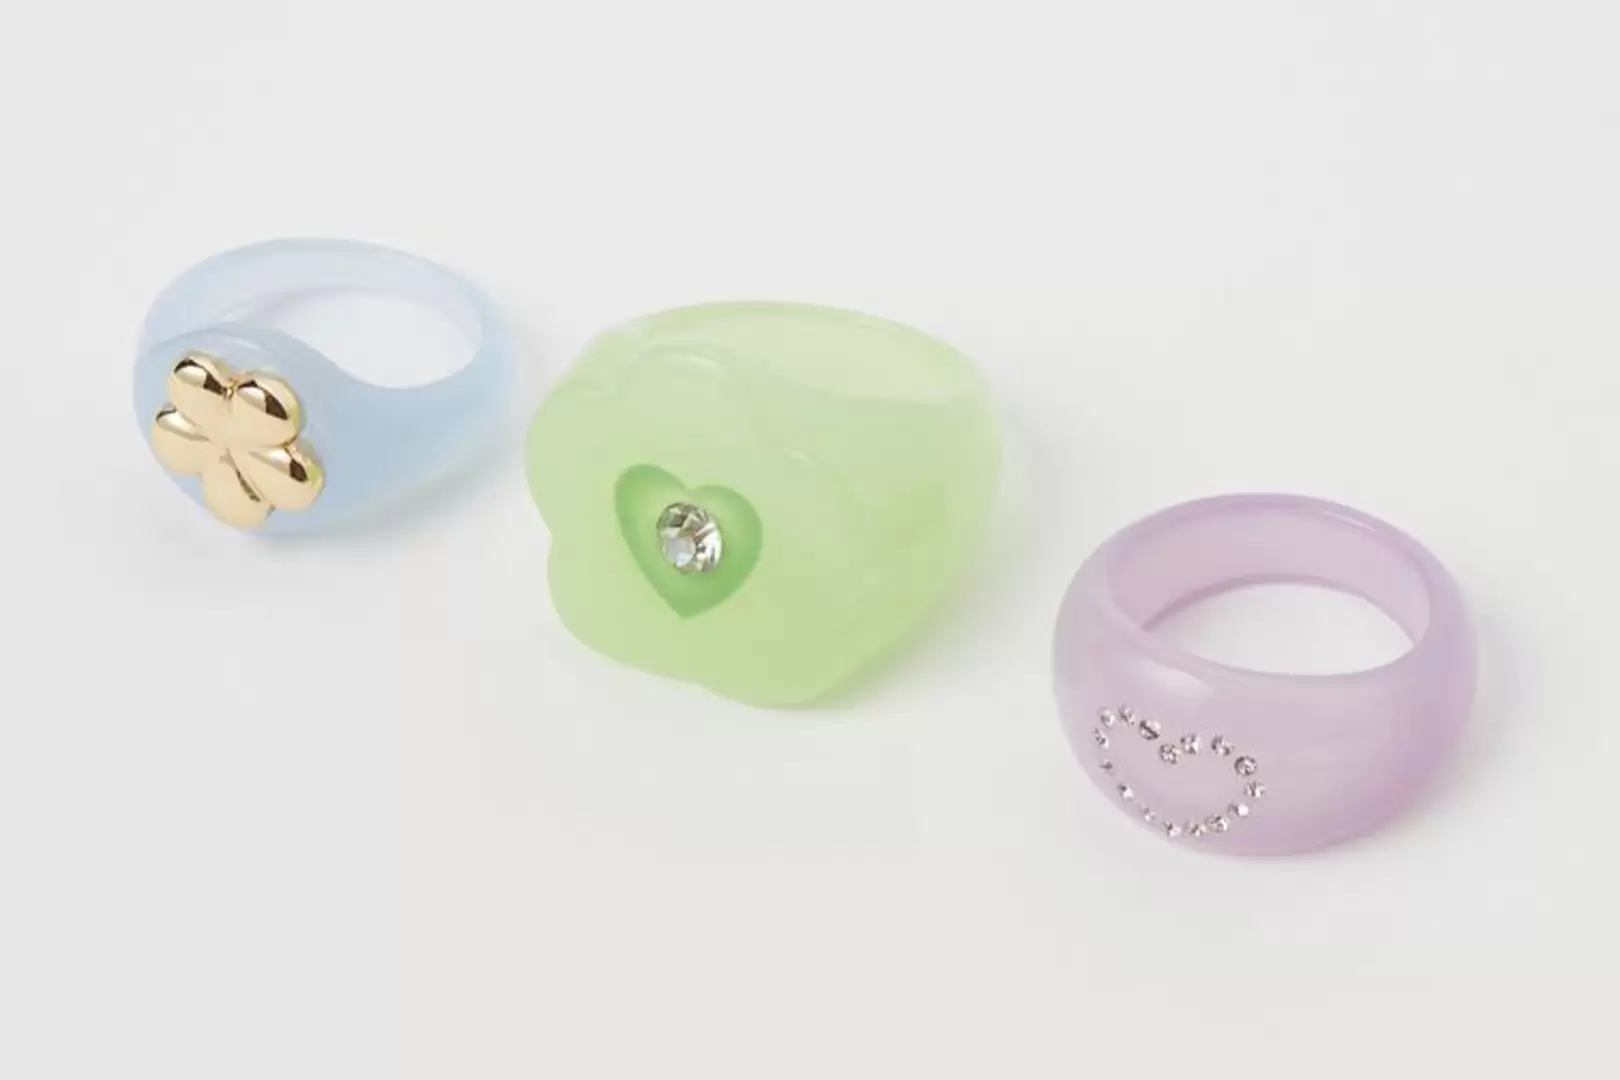 TikTok's nieuwste sieradentrend: chunky ringen